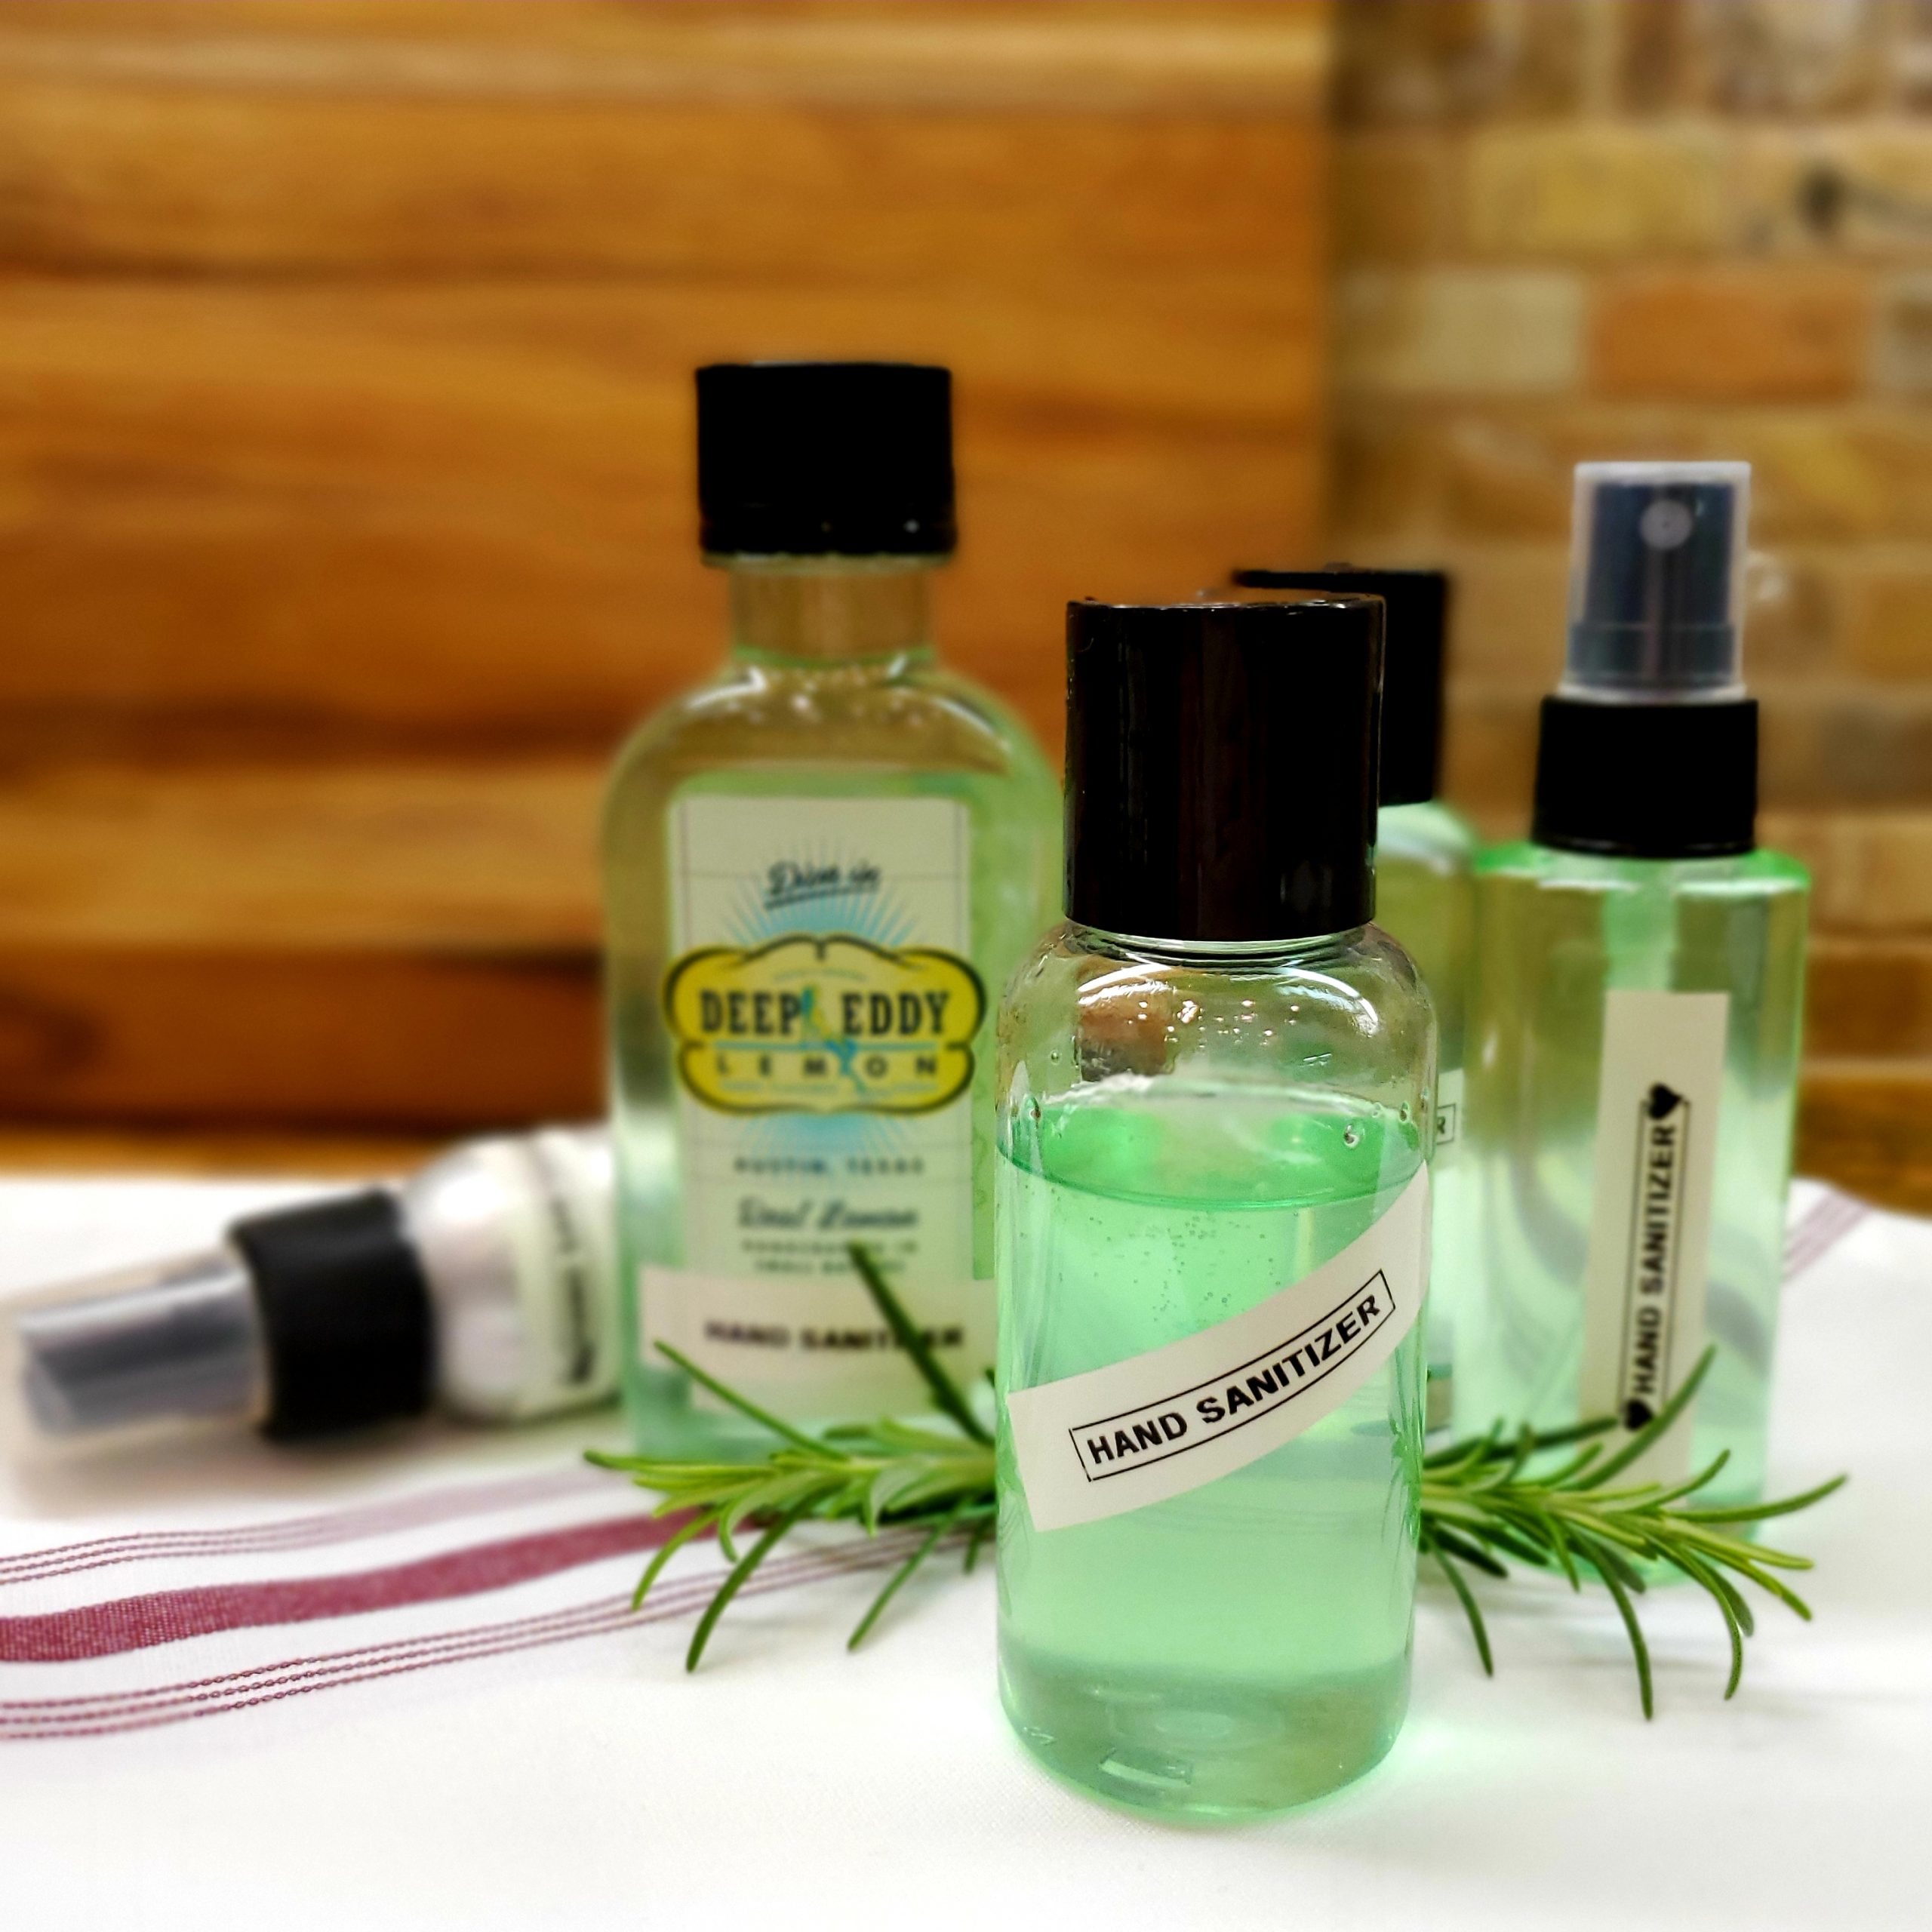 Make Hand Sanitizer @ Home